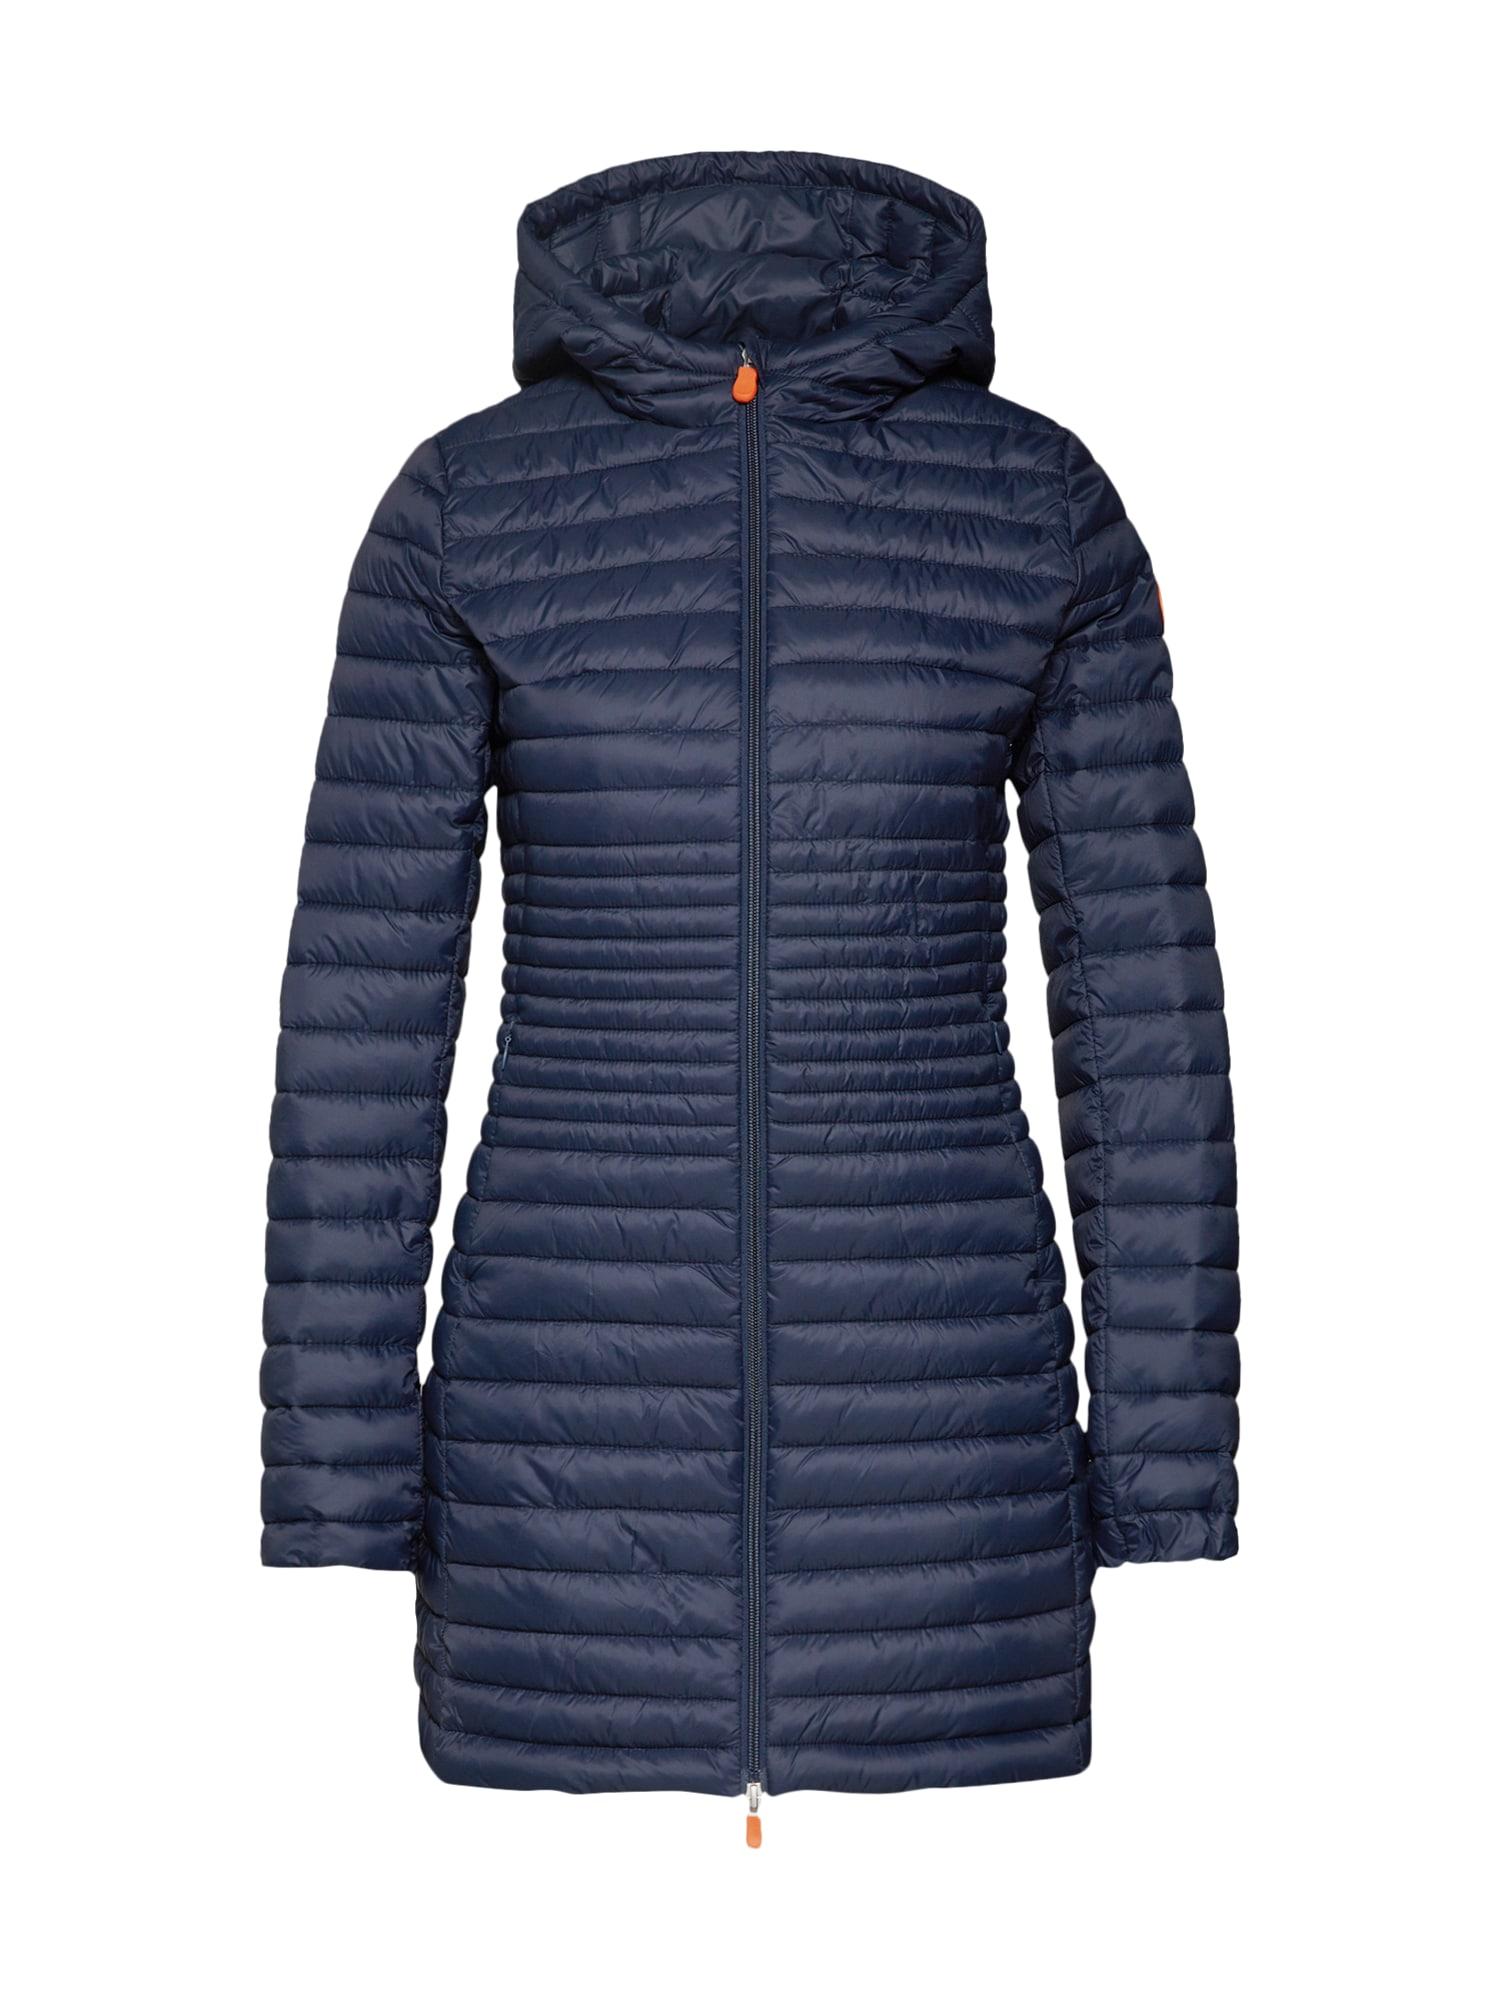 Zimní kabát GIGA8 tmavě modrá černá SAVE THE DUCK